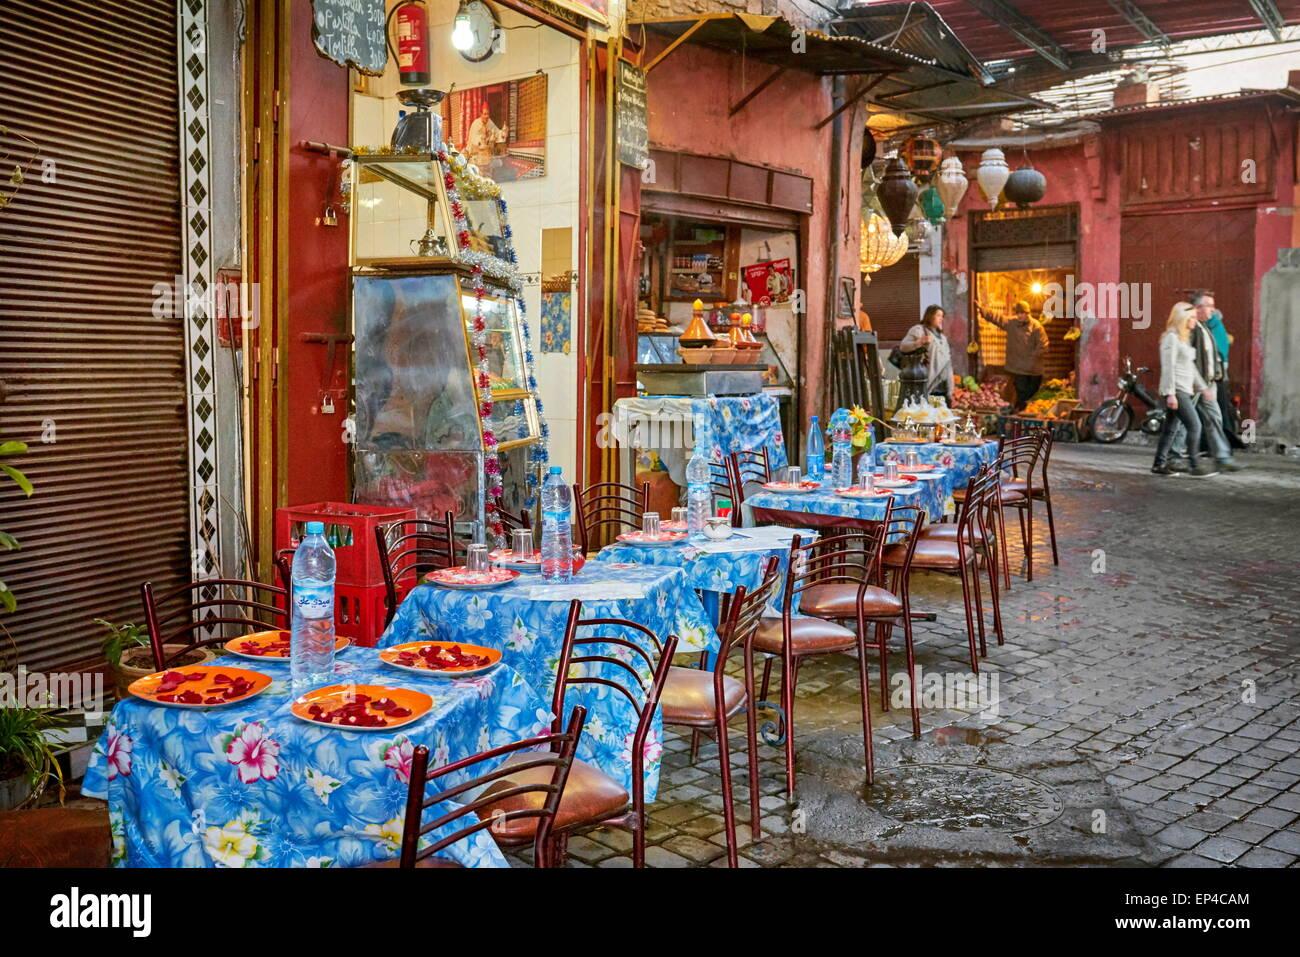 Eine lokale Straße Restaurant in der Nähe des Djemaa el-Fna-Platz, Marrakech Medina, Marokko, Afrika Stockbild